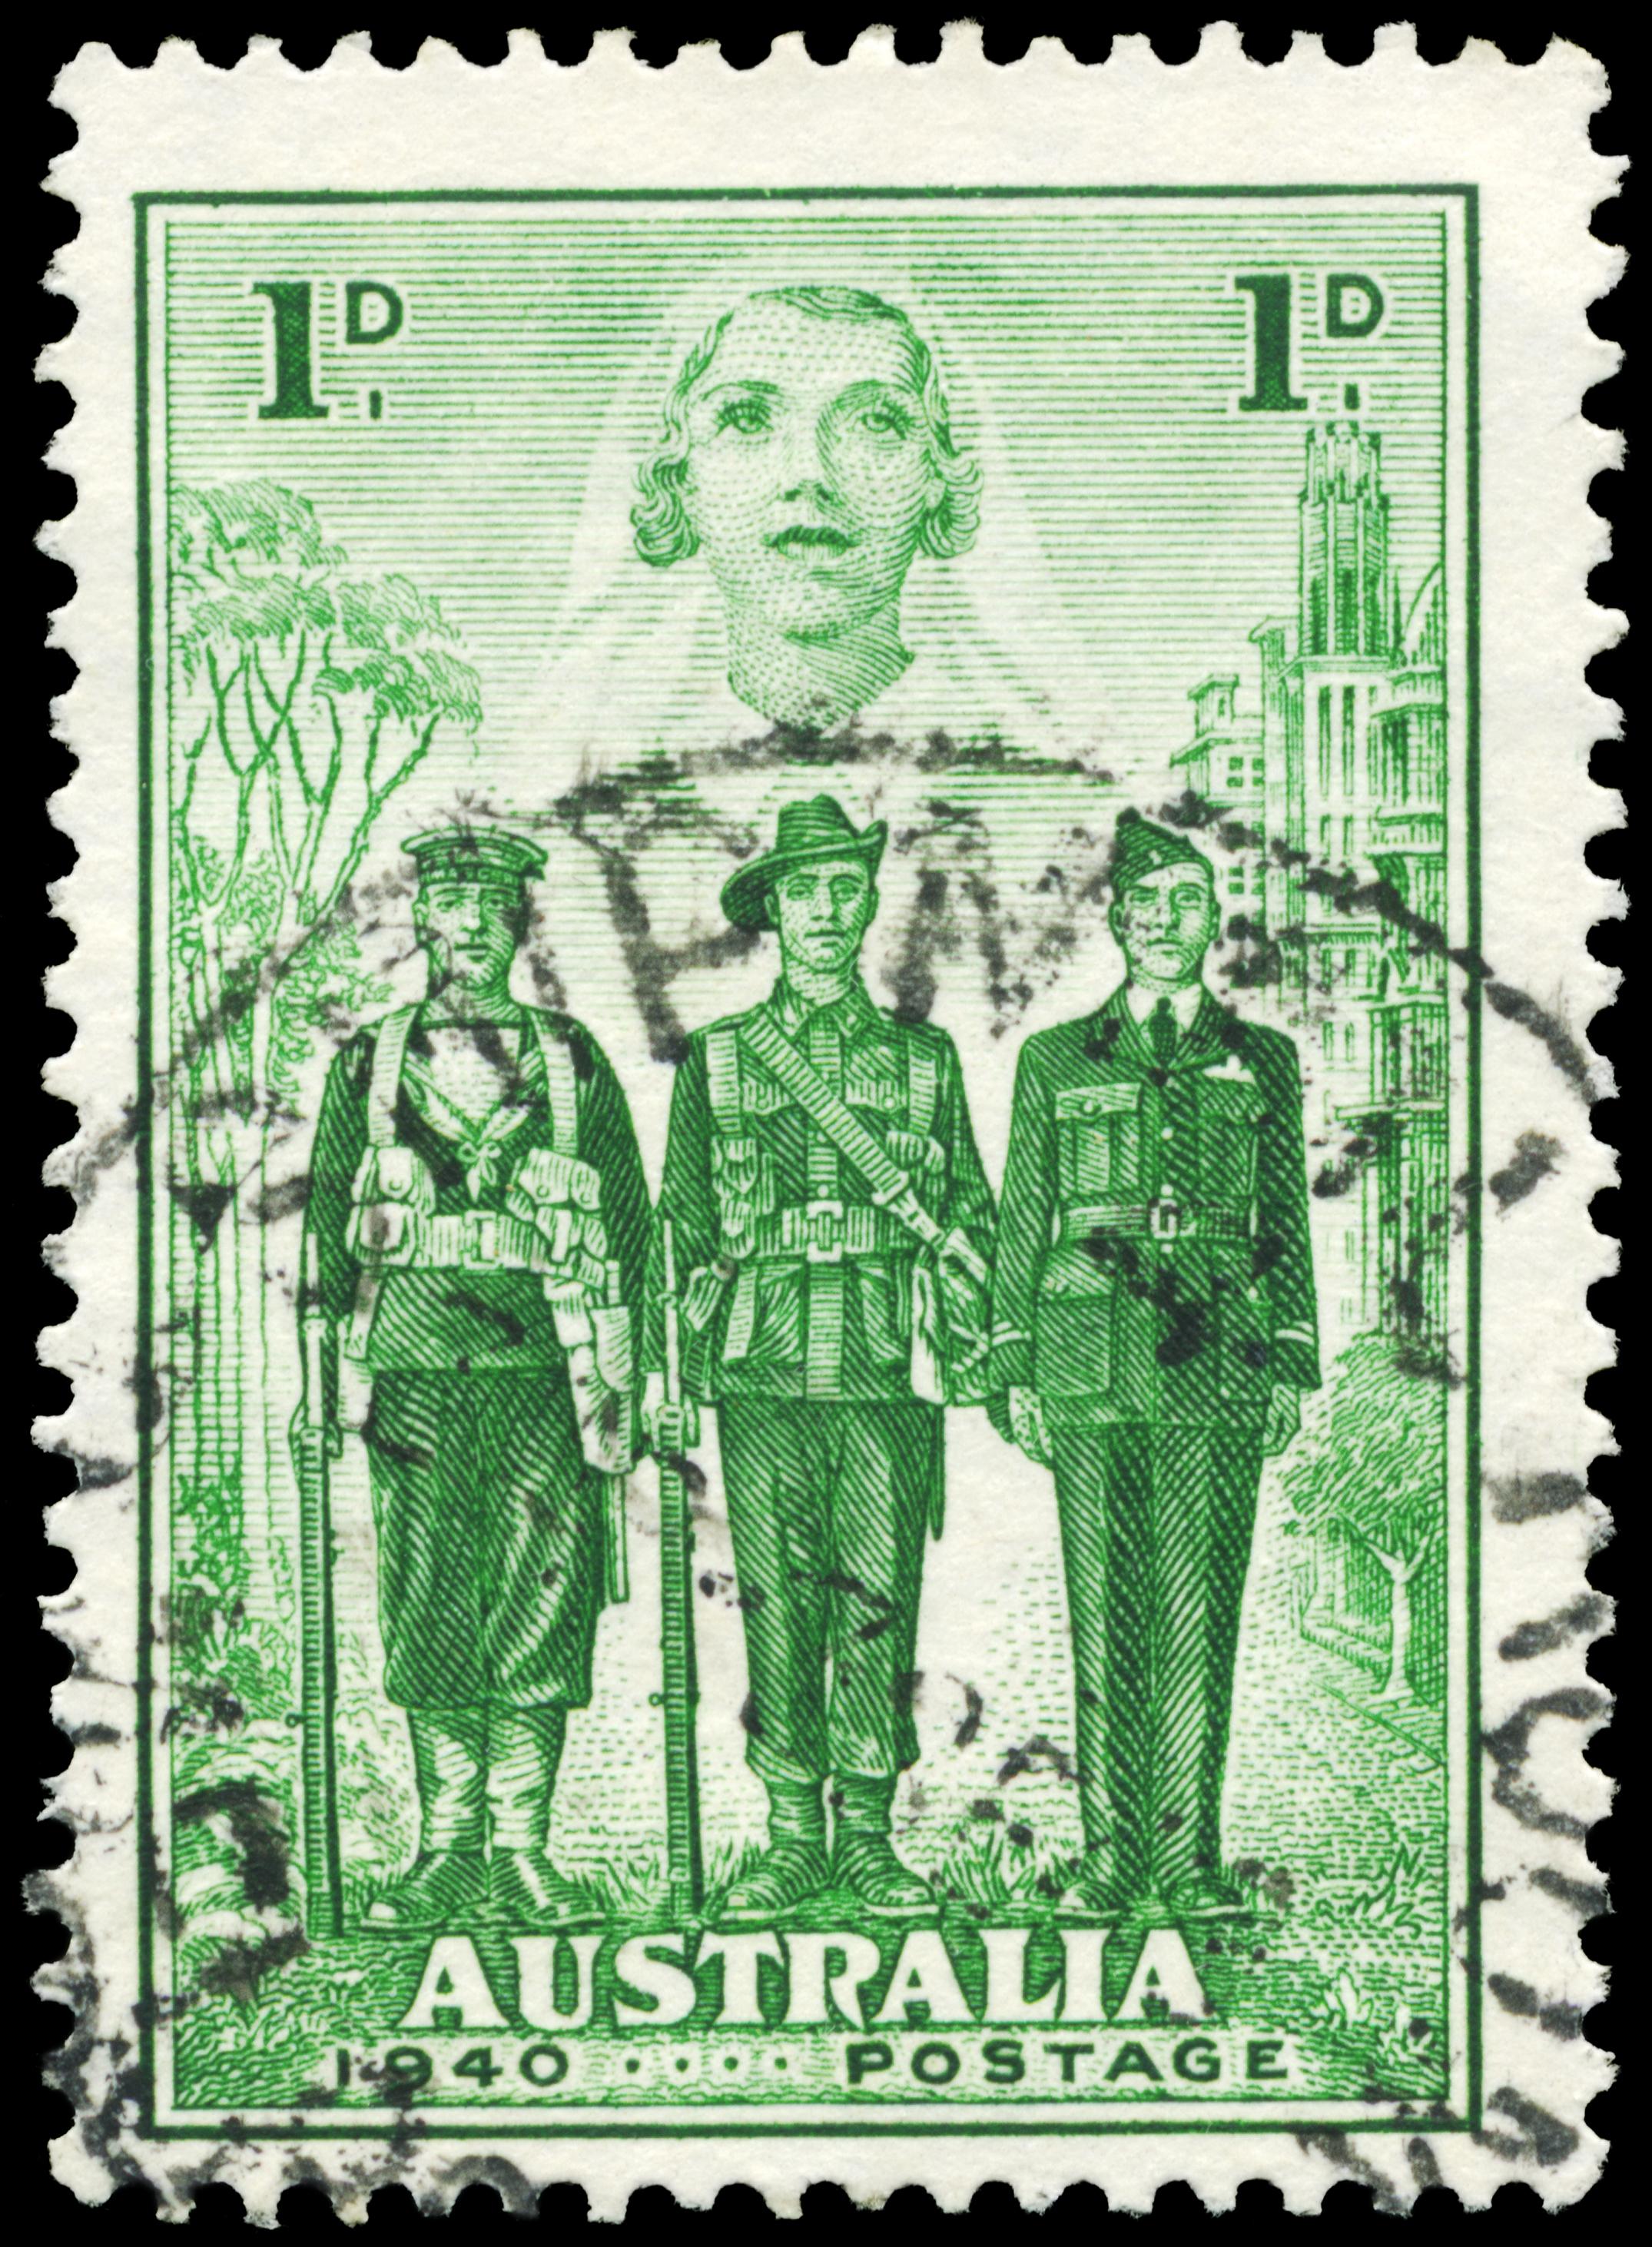 Waiting   Australian Postage Stamp 1940 iStock-178508764.jpg